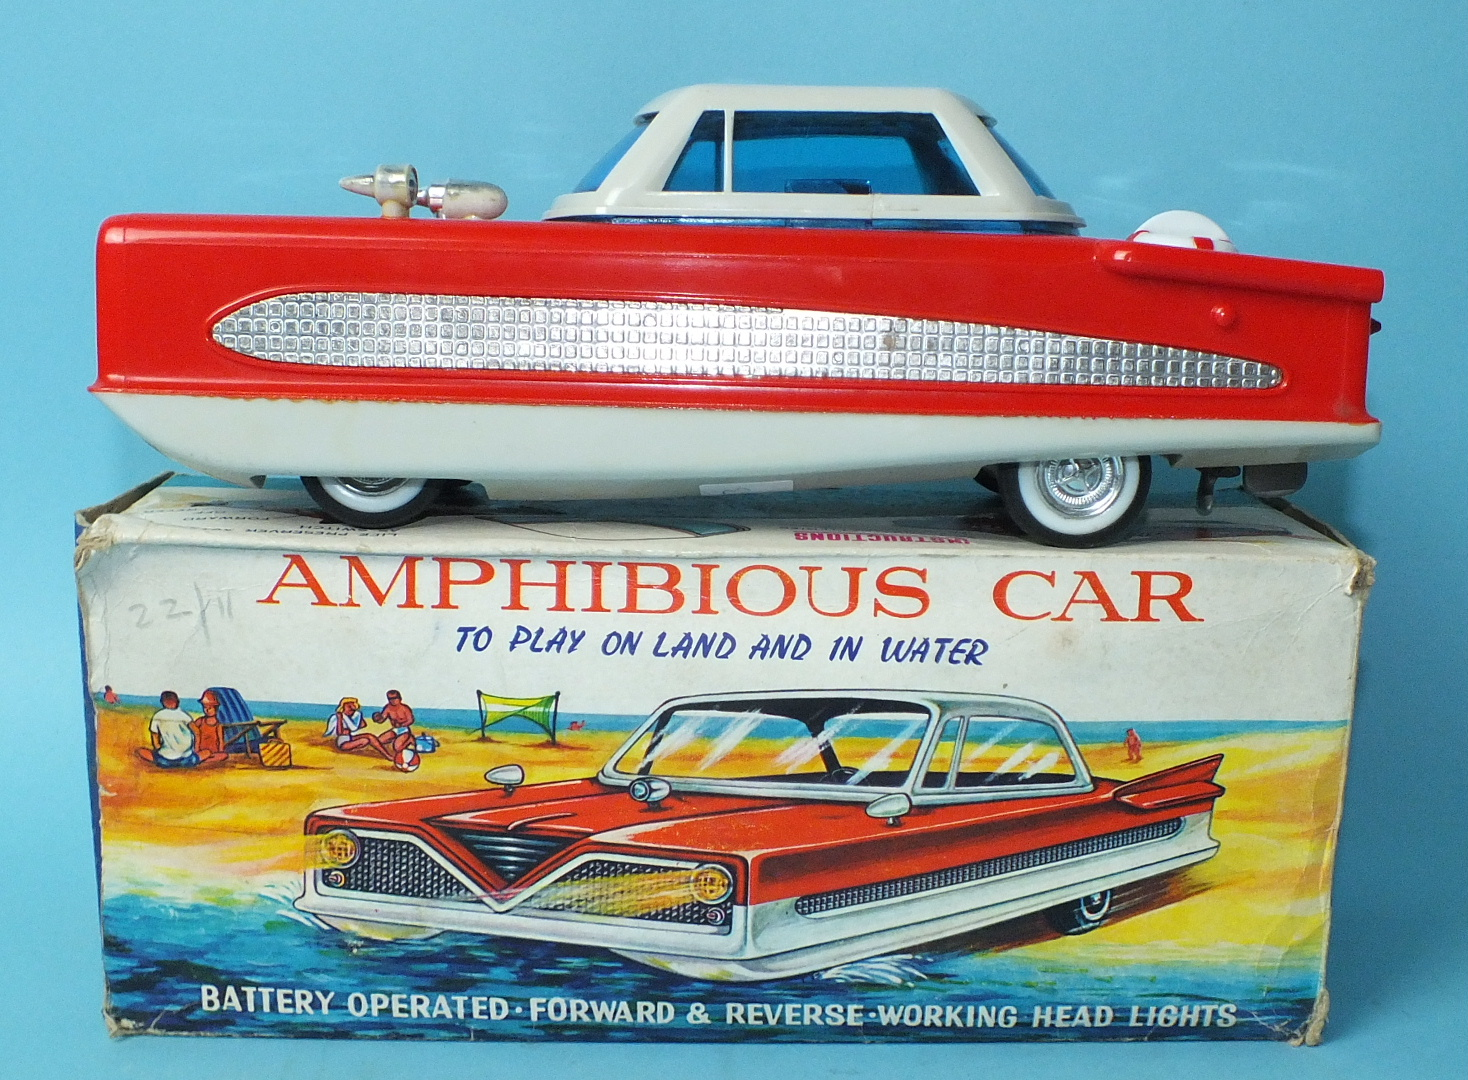 Lot 504 - A battery-operated Amphibious Car by H-I-S, Hong Kong, no.R3317, boxed.